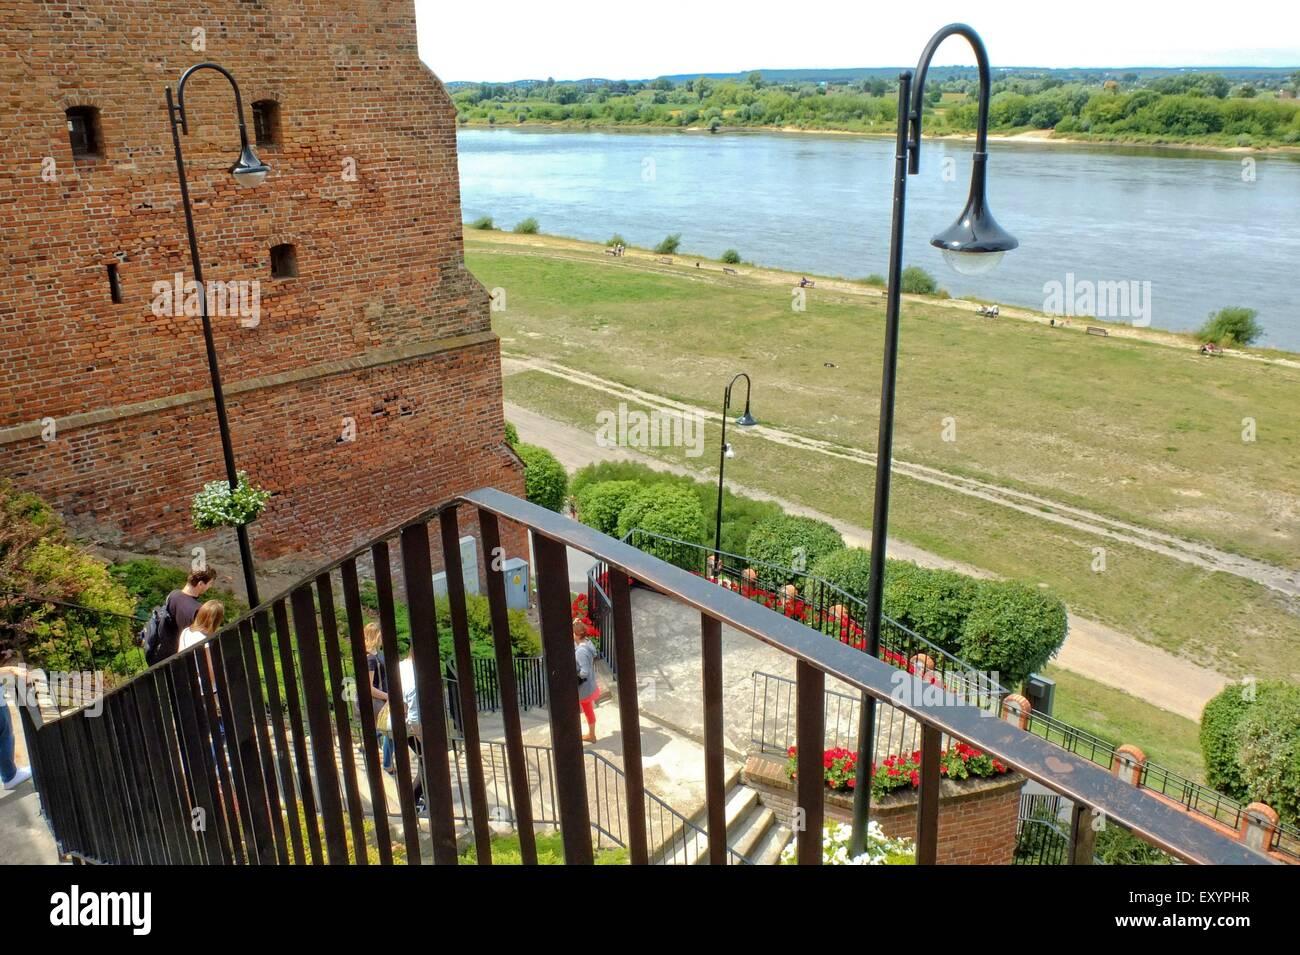 Grudziadz, Poland 12th, July 2015 General view of city of Grudziadz laid on the Vistula River in northern Poland. Stock Photo